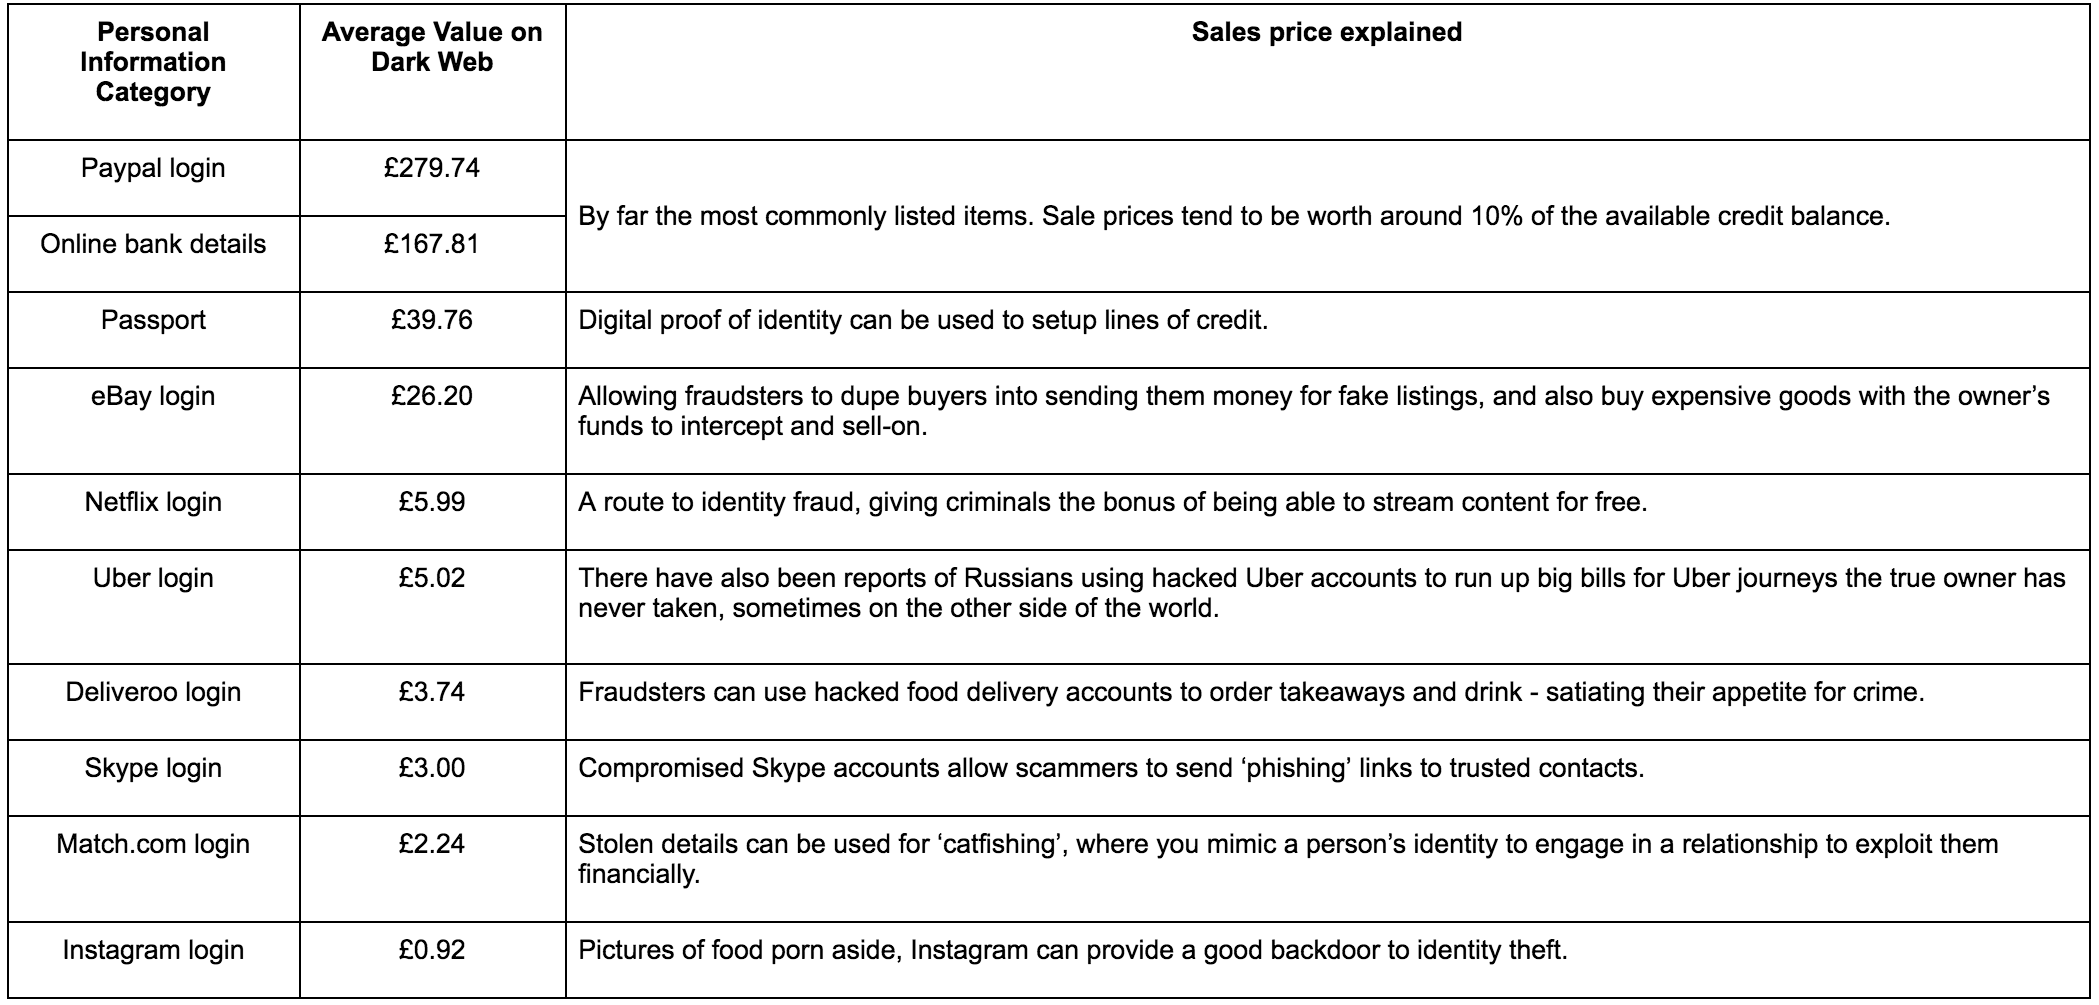 Dark web hacked personal data price list